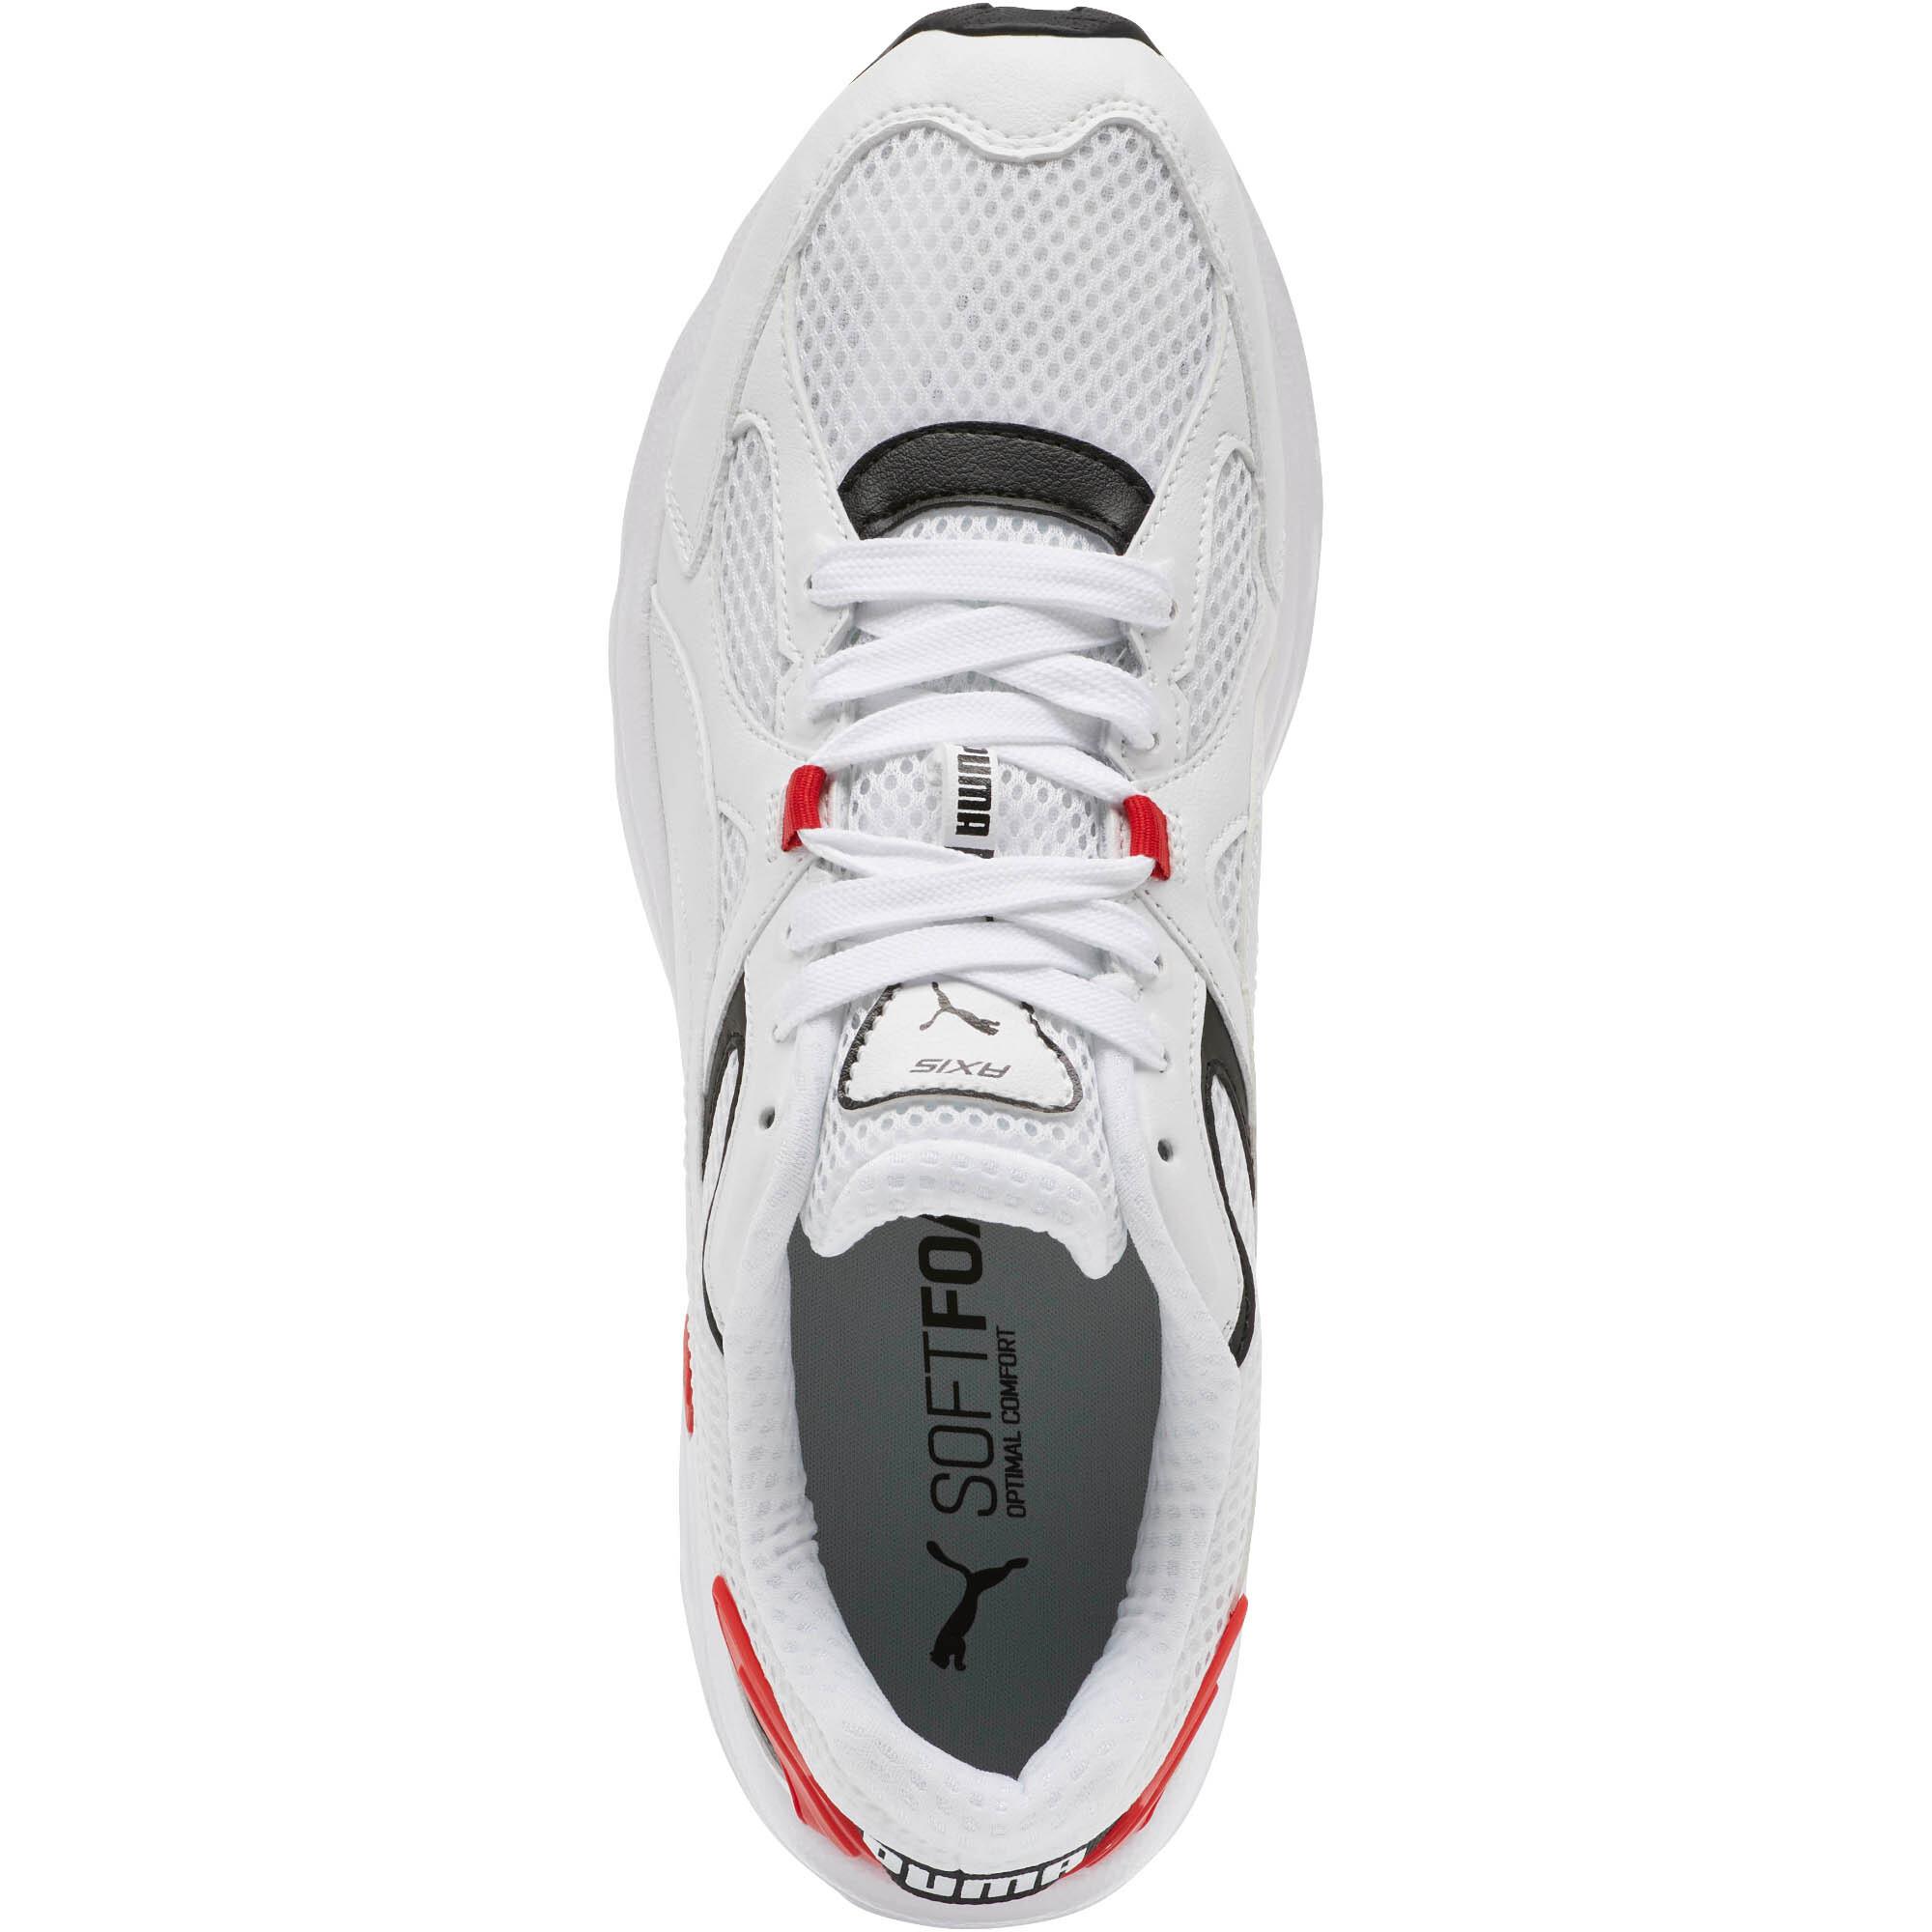 PUMA-Axis-Plus-90s-Sneakers-Men-Shoe-Basics thumbnail 14